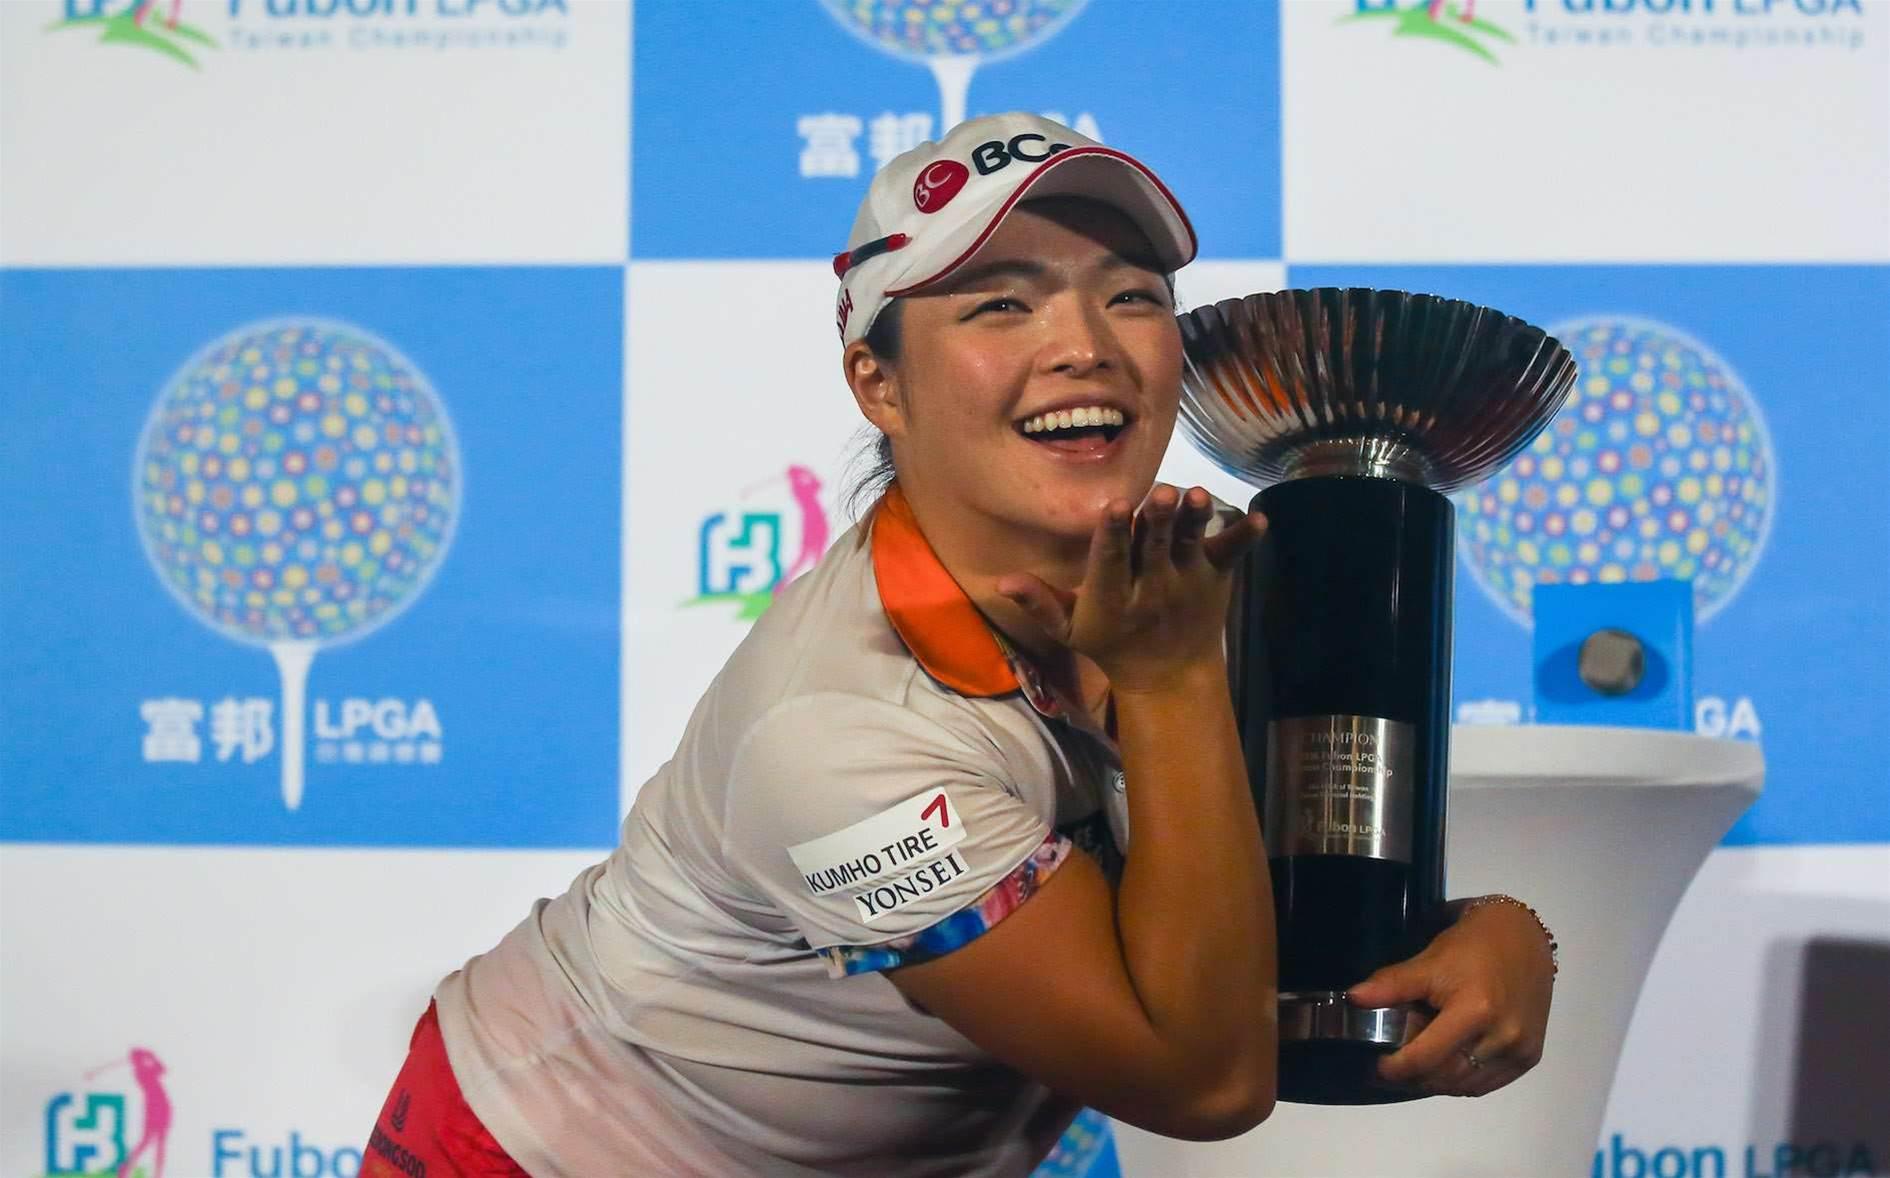 LPGA: Jang fends off fast-finishing Feng